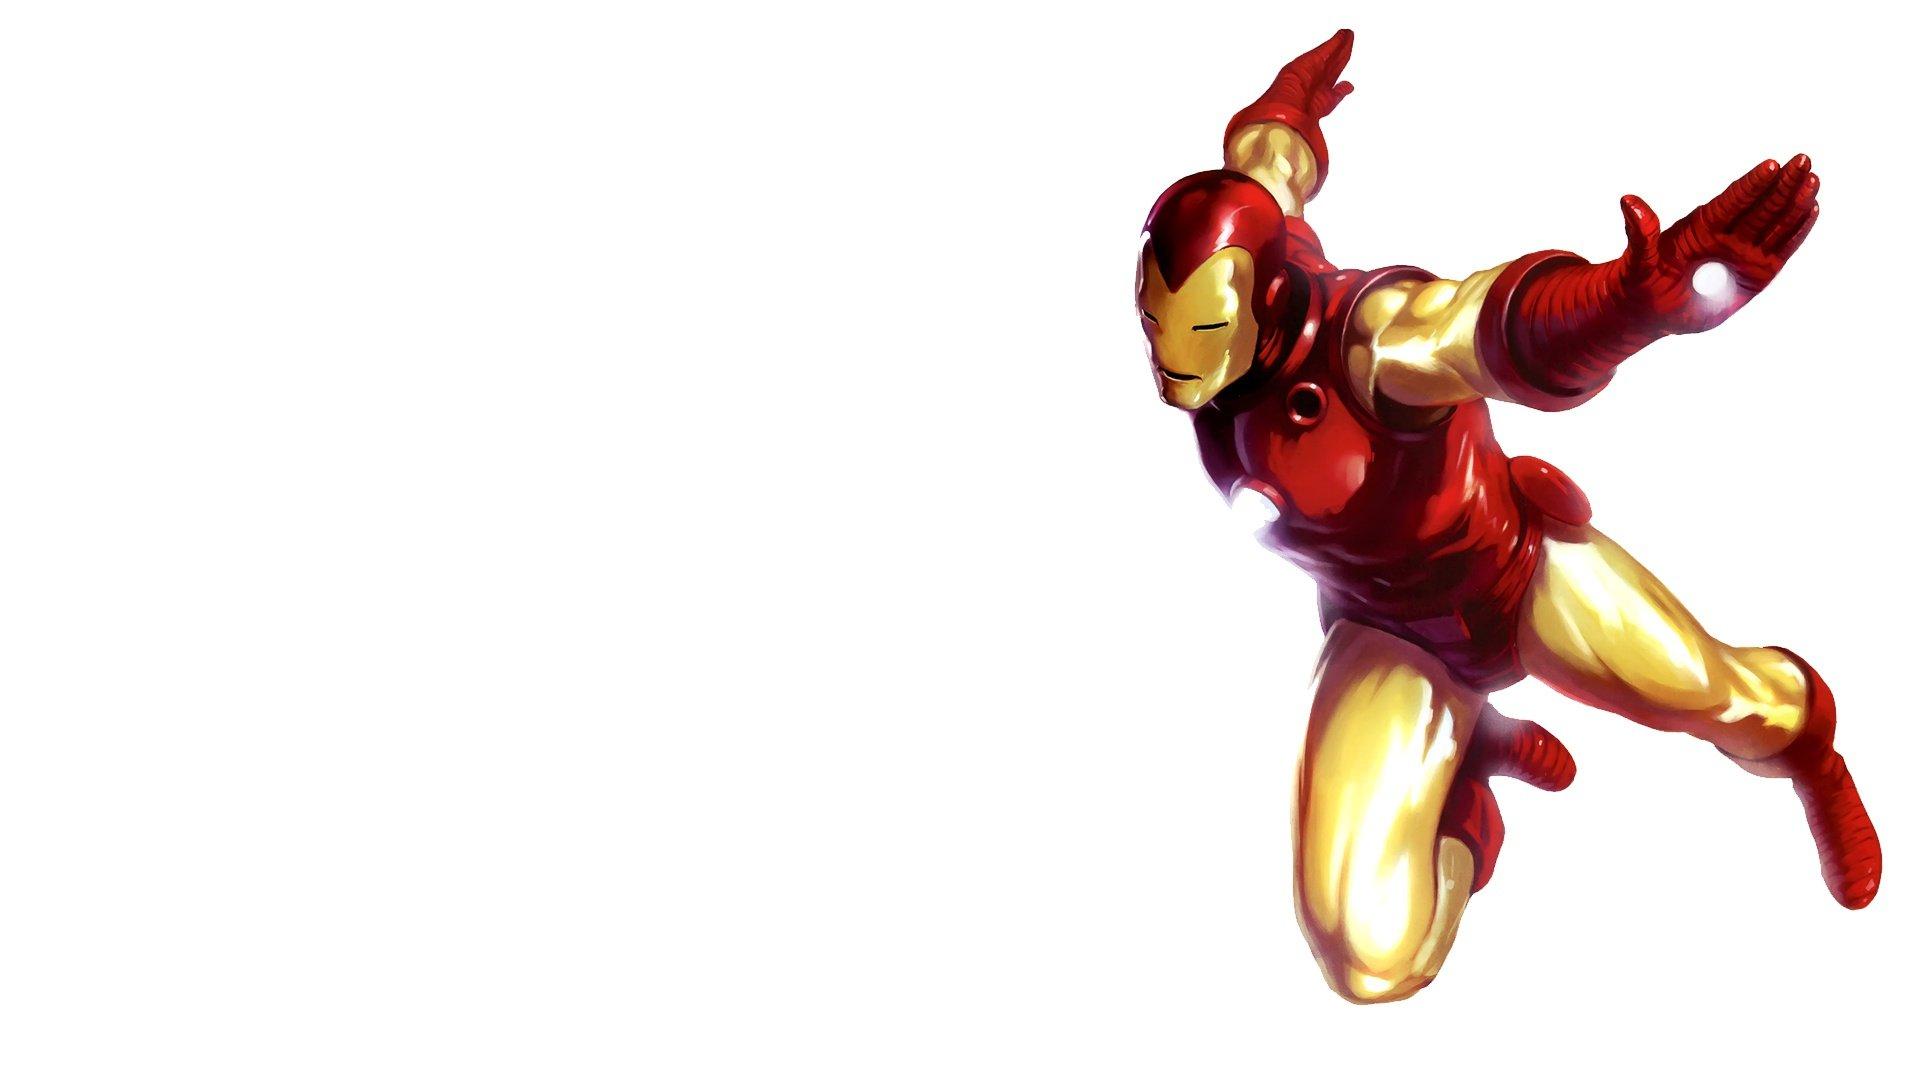 Iron Man Comic Wallpapers Desktop - Wickedsa com